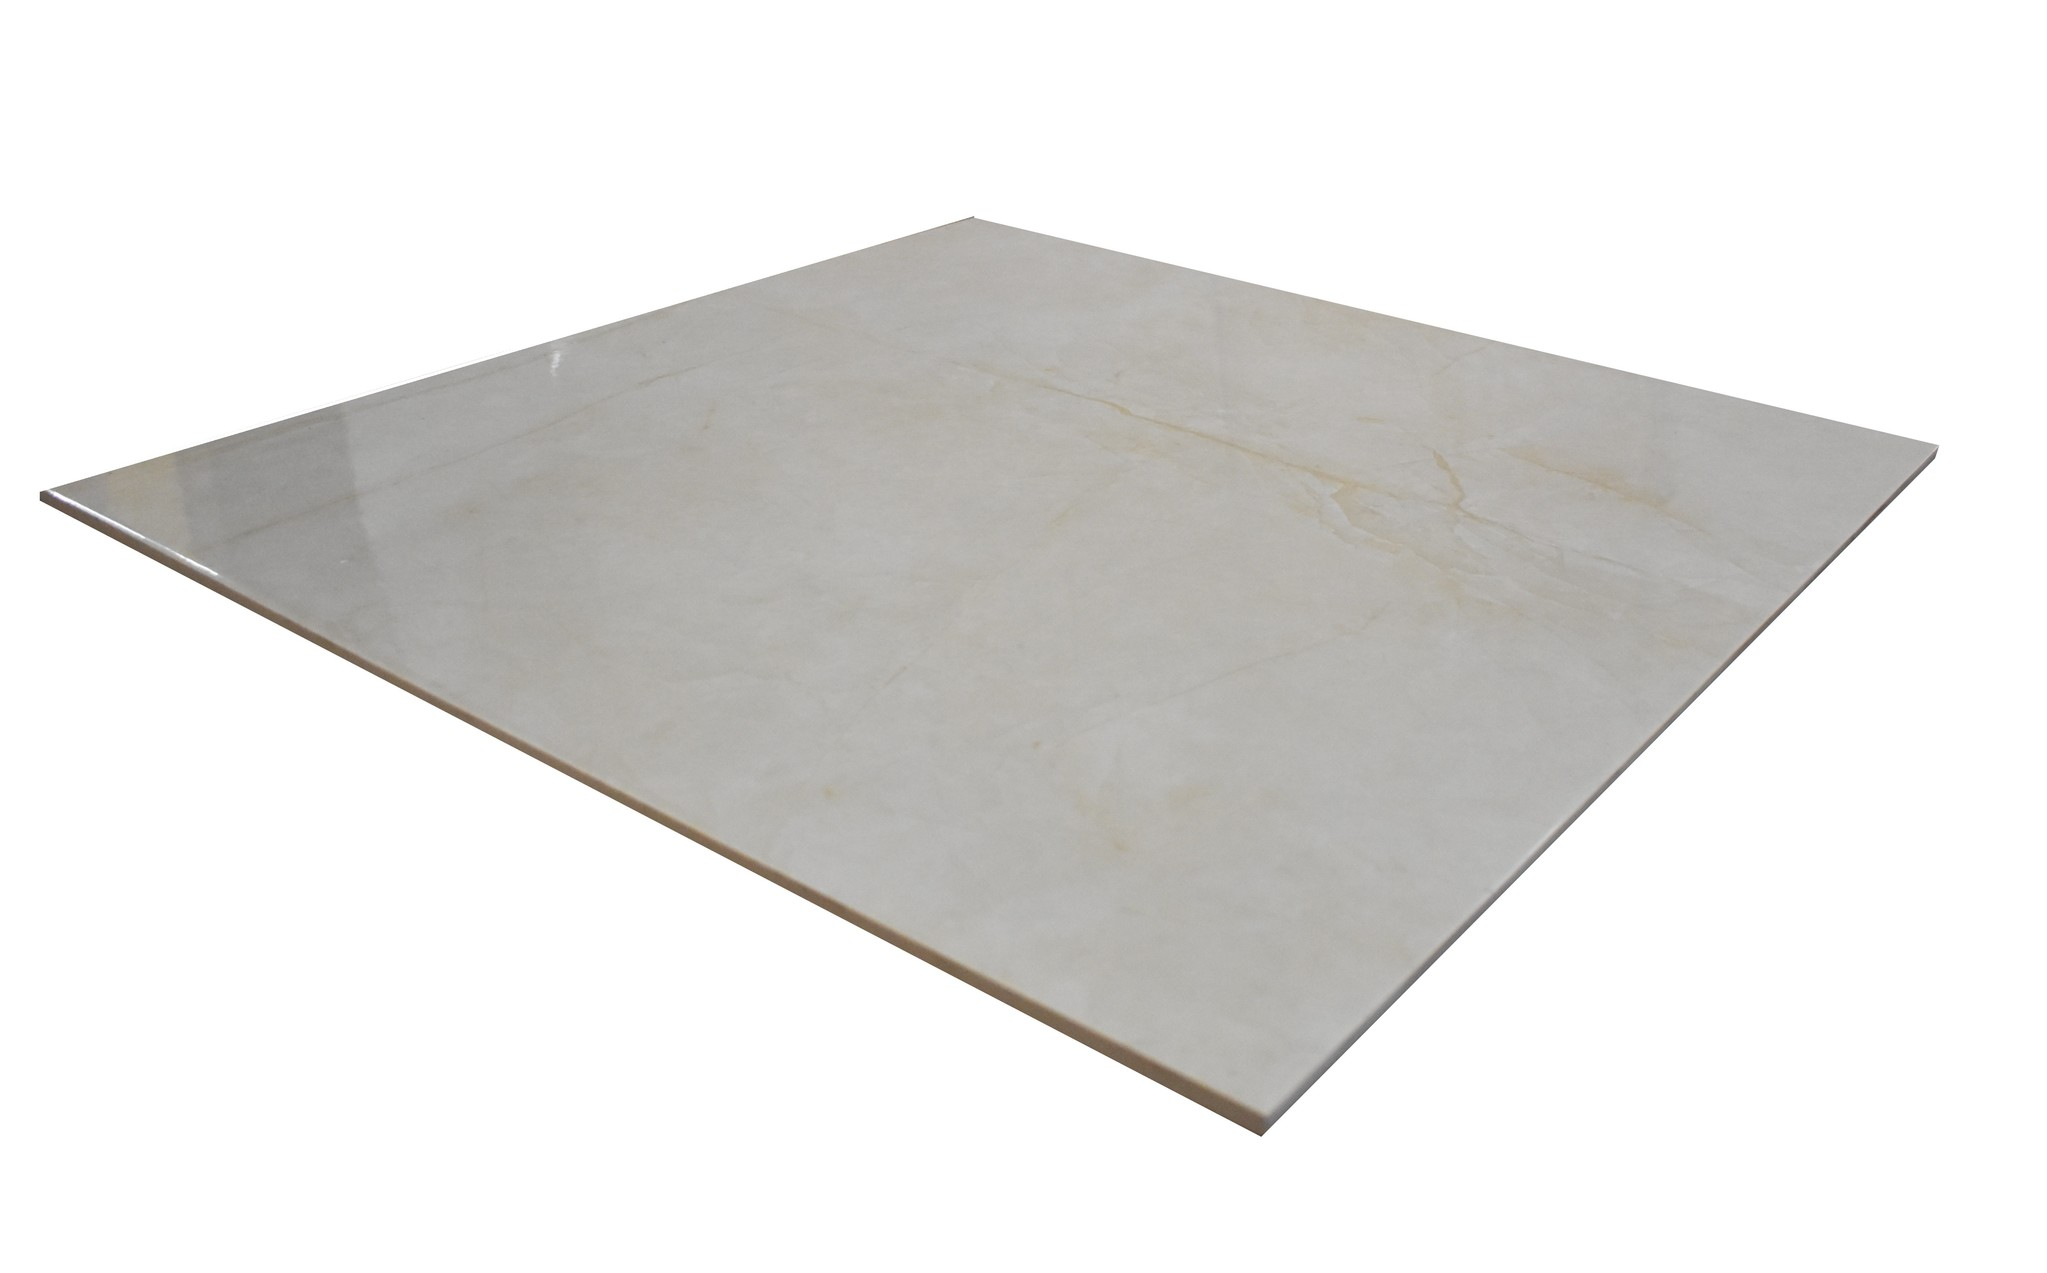 Floor Tiles Montocoto Crema